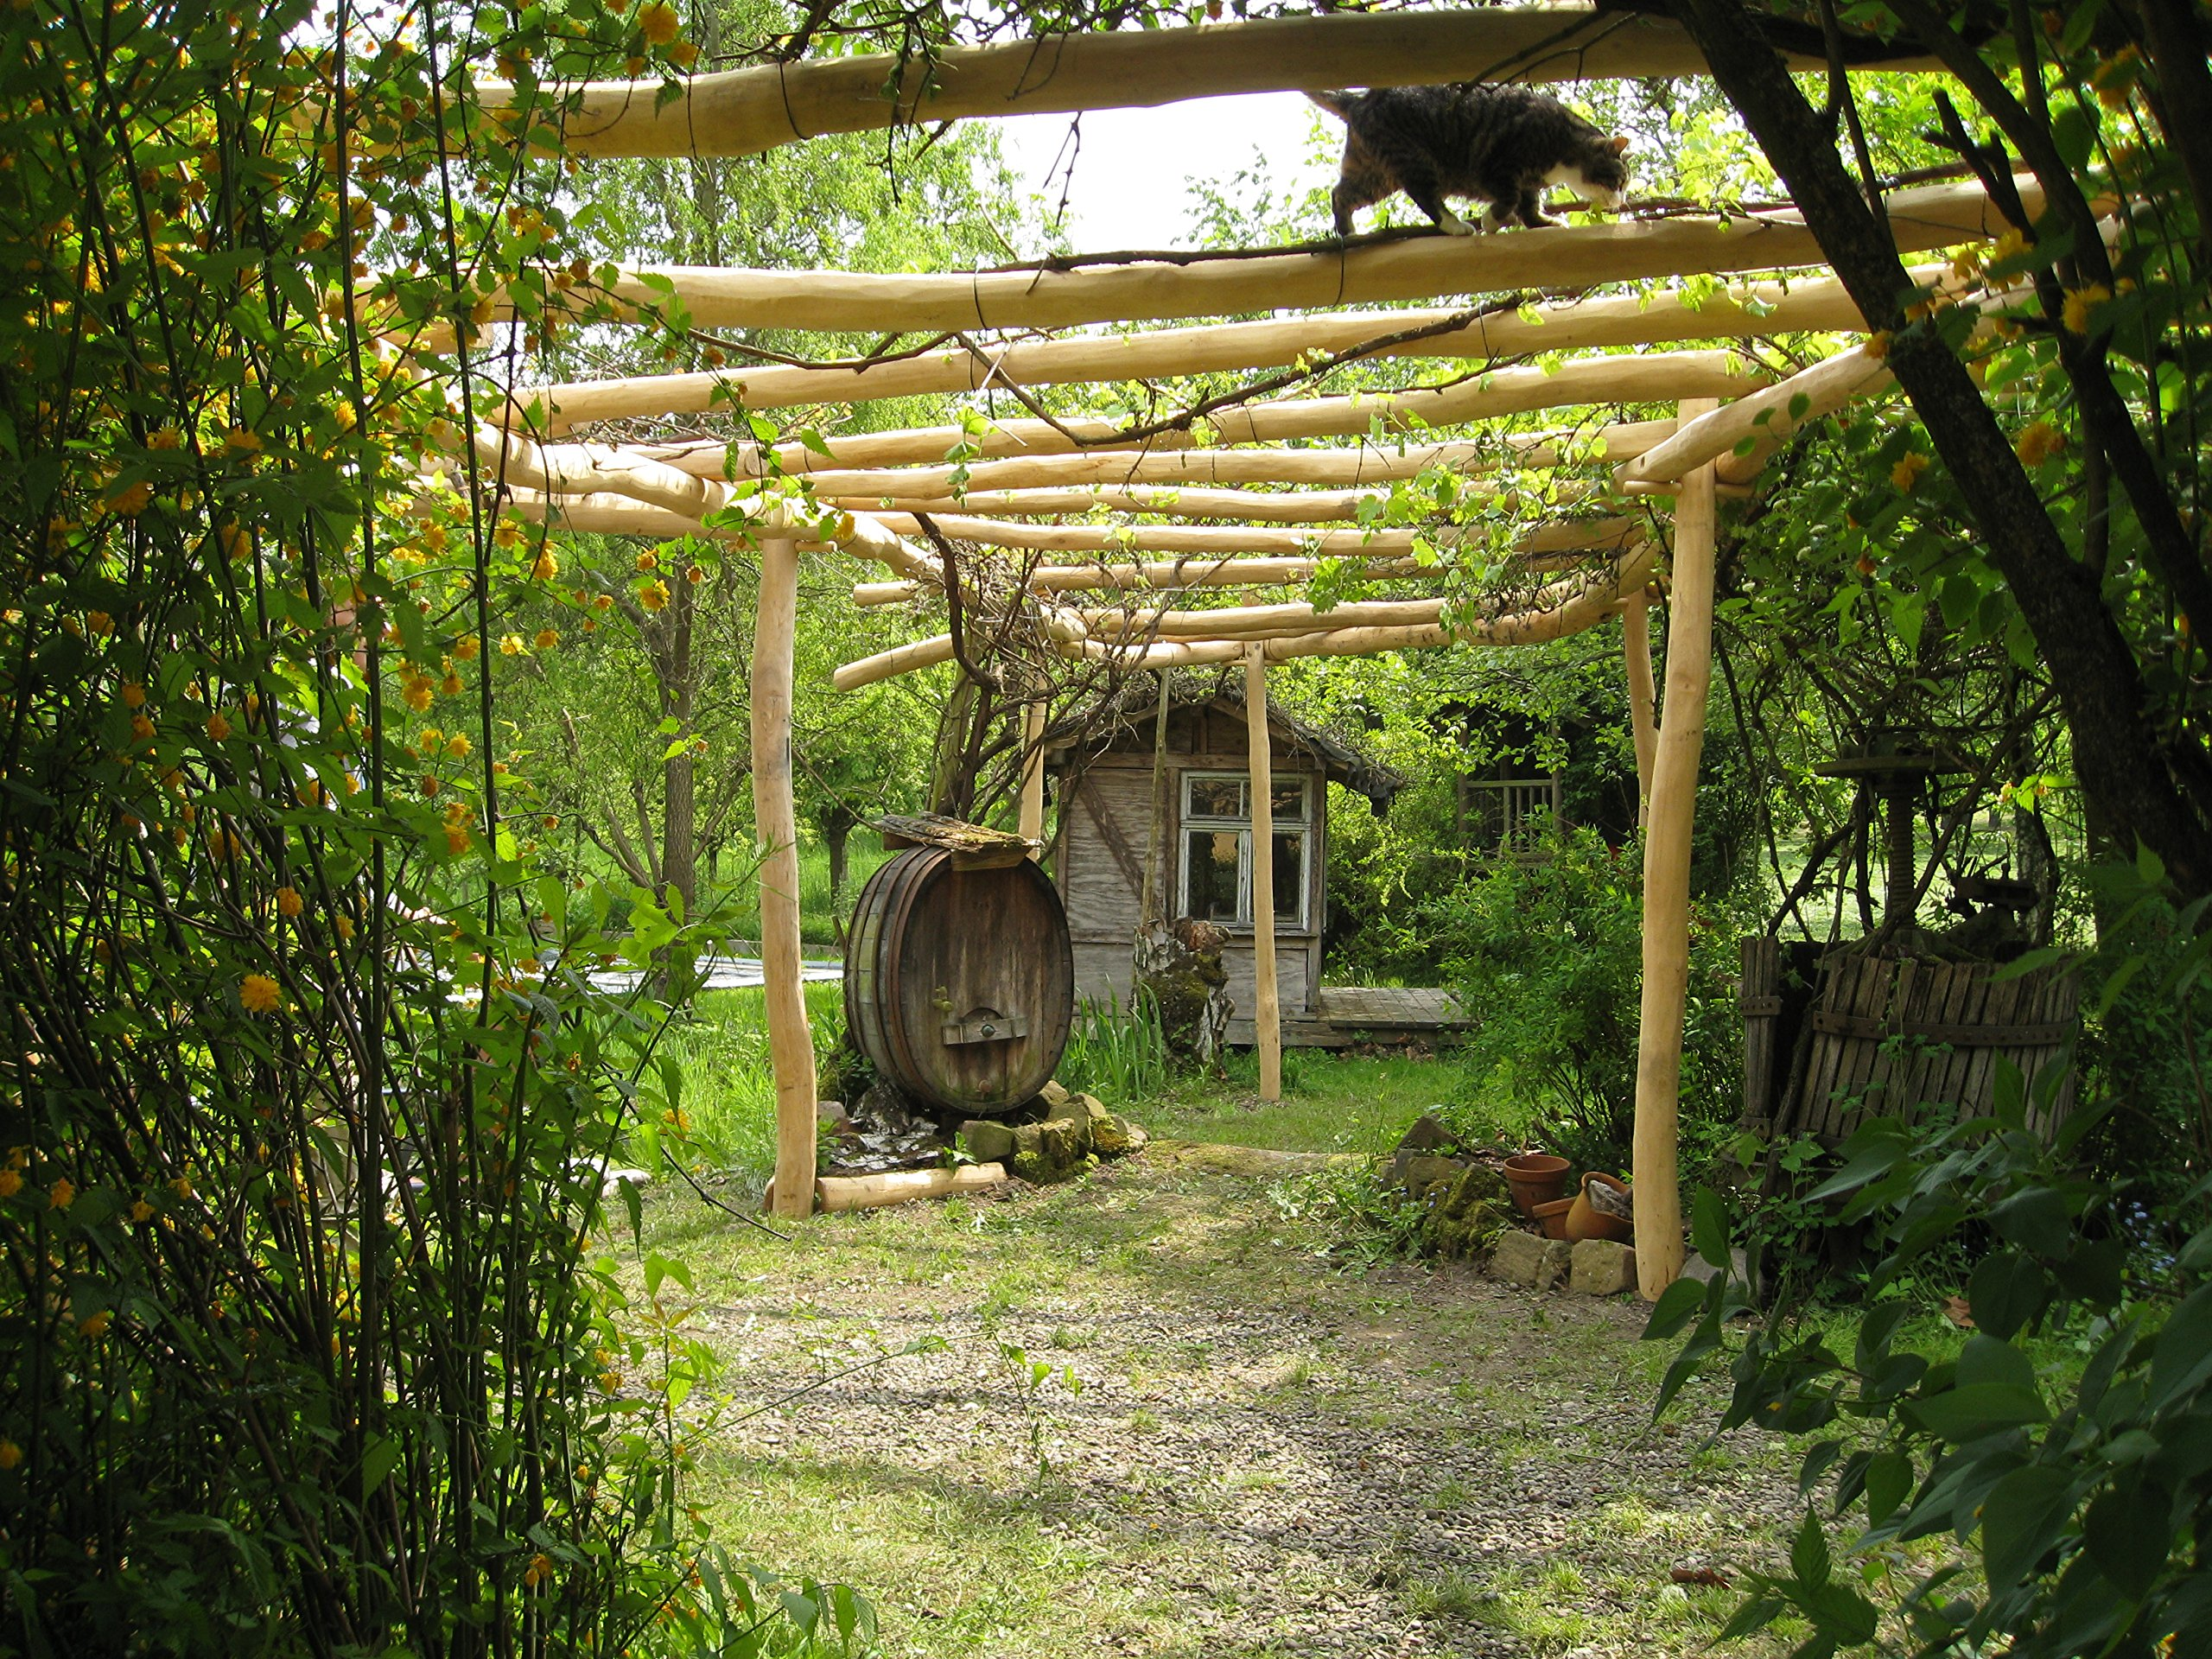 B + T rob080100 de acacia A4 tronco/Ø 80 – 100 mm/L: 4,00 m: Amazon.es: Jardín